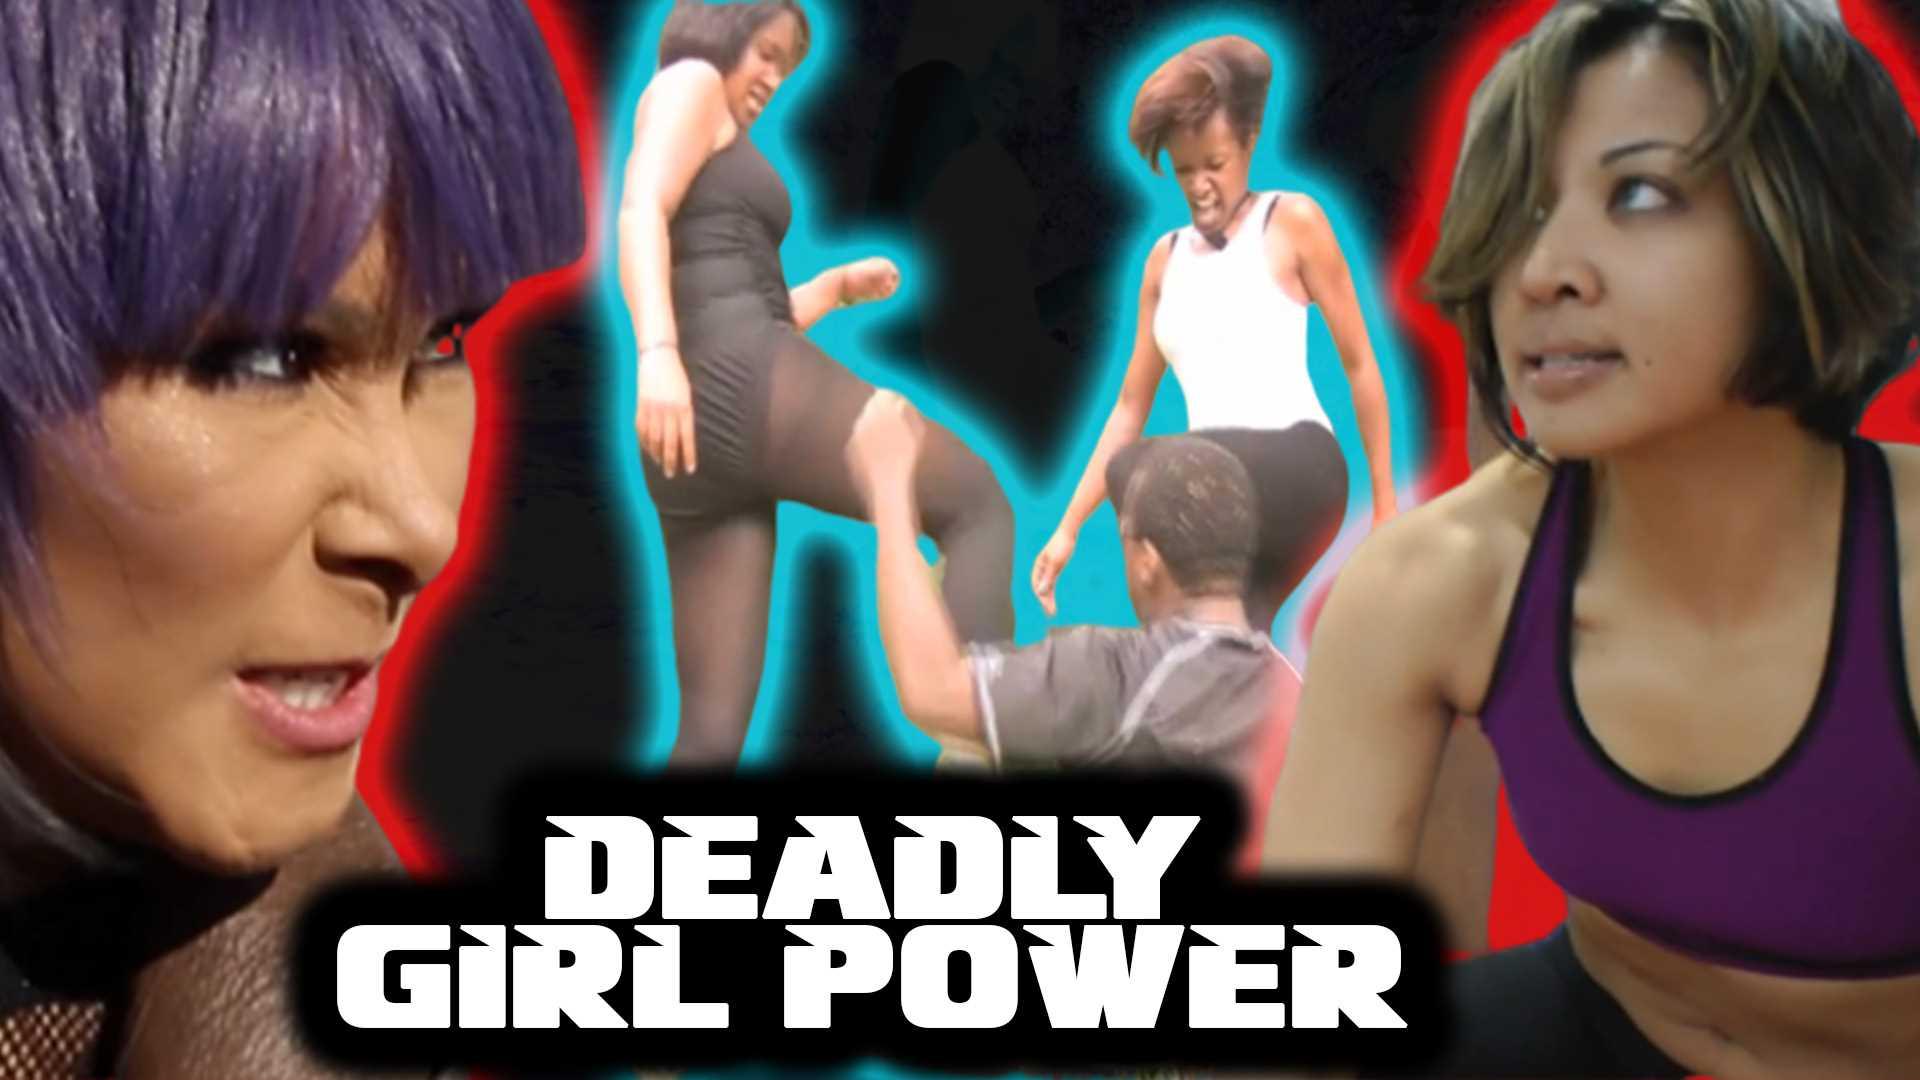 DeadlyDymes | Deadly Dymes | DEADLY GIRL POWER